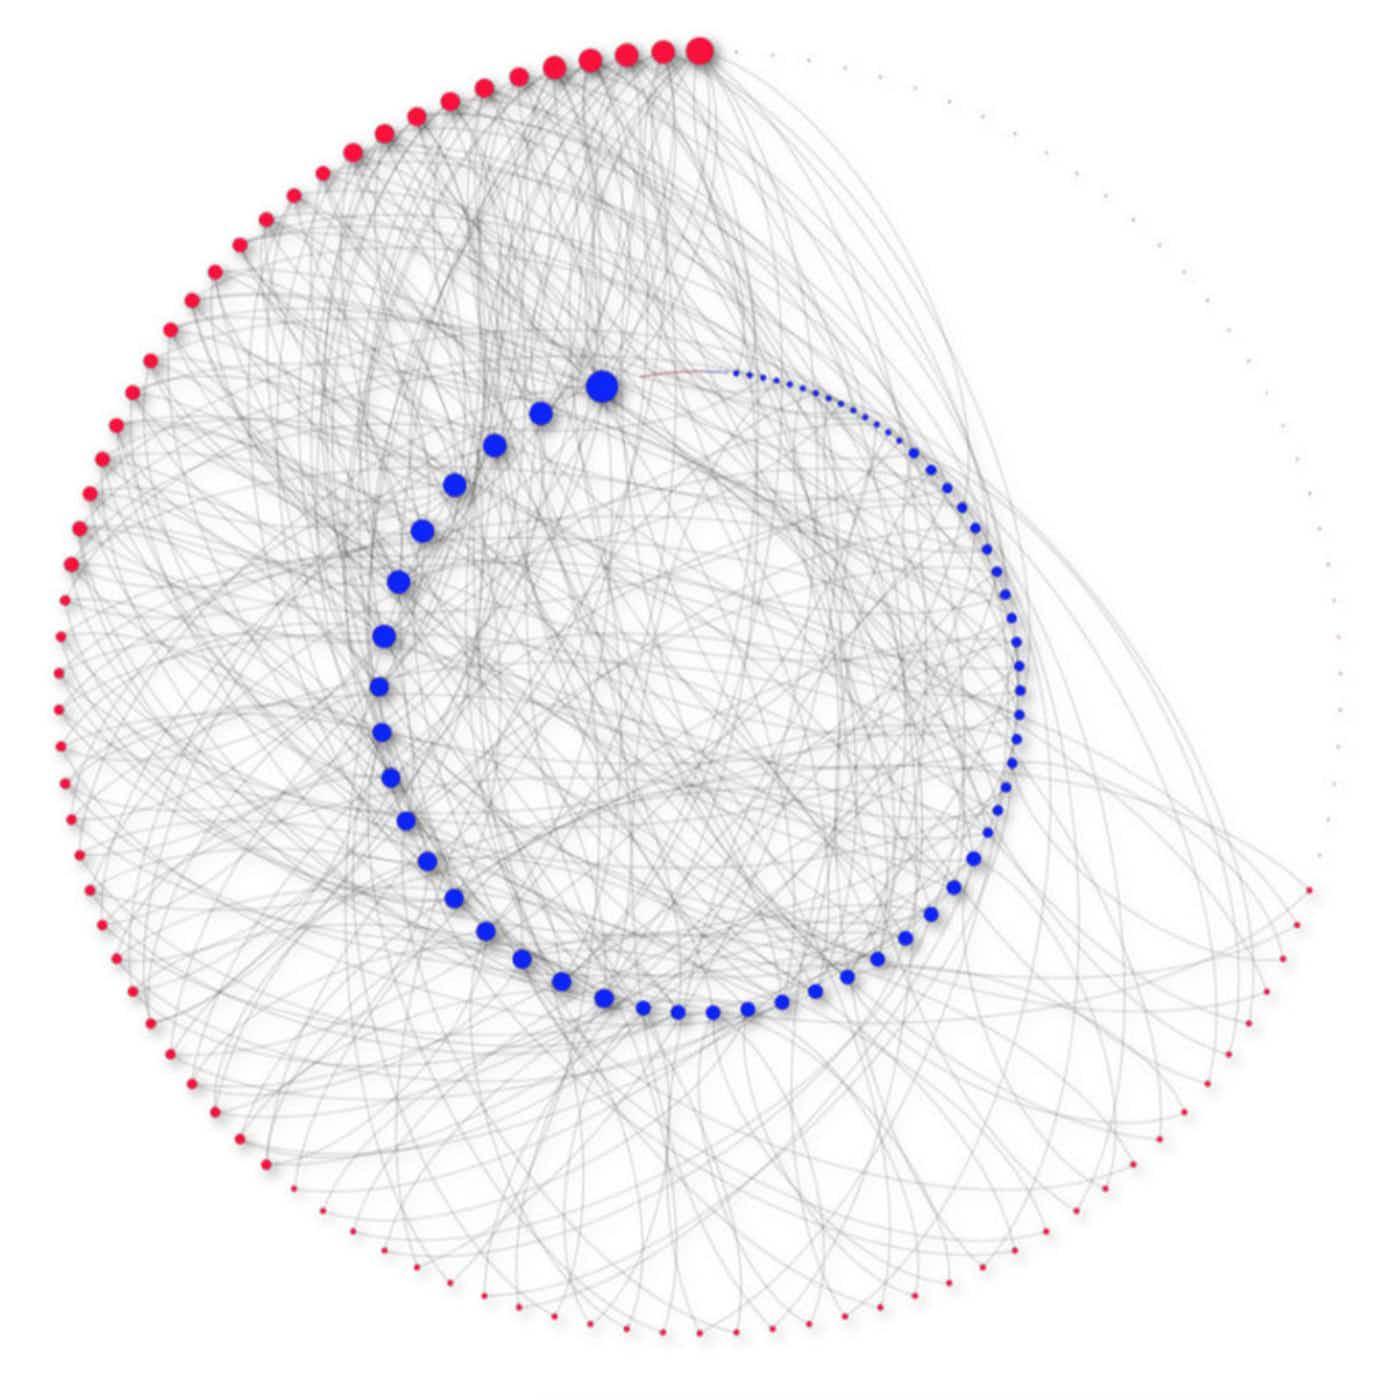 Degree-correlations in a bursting dynamic network model